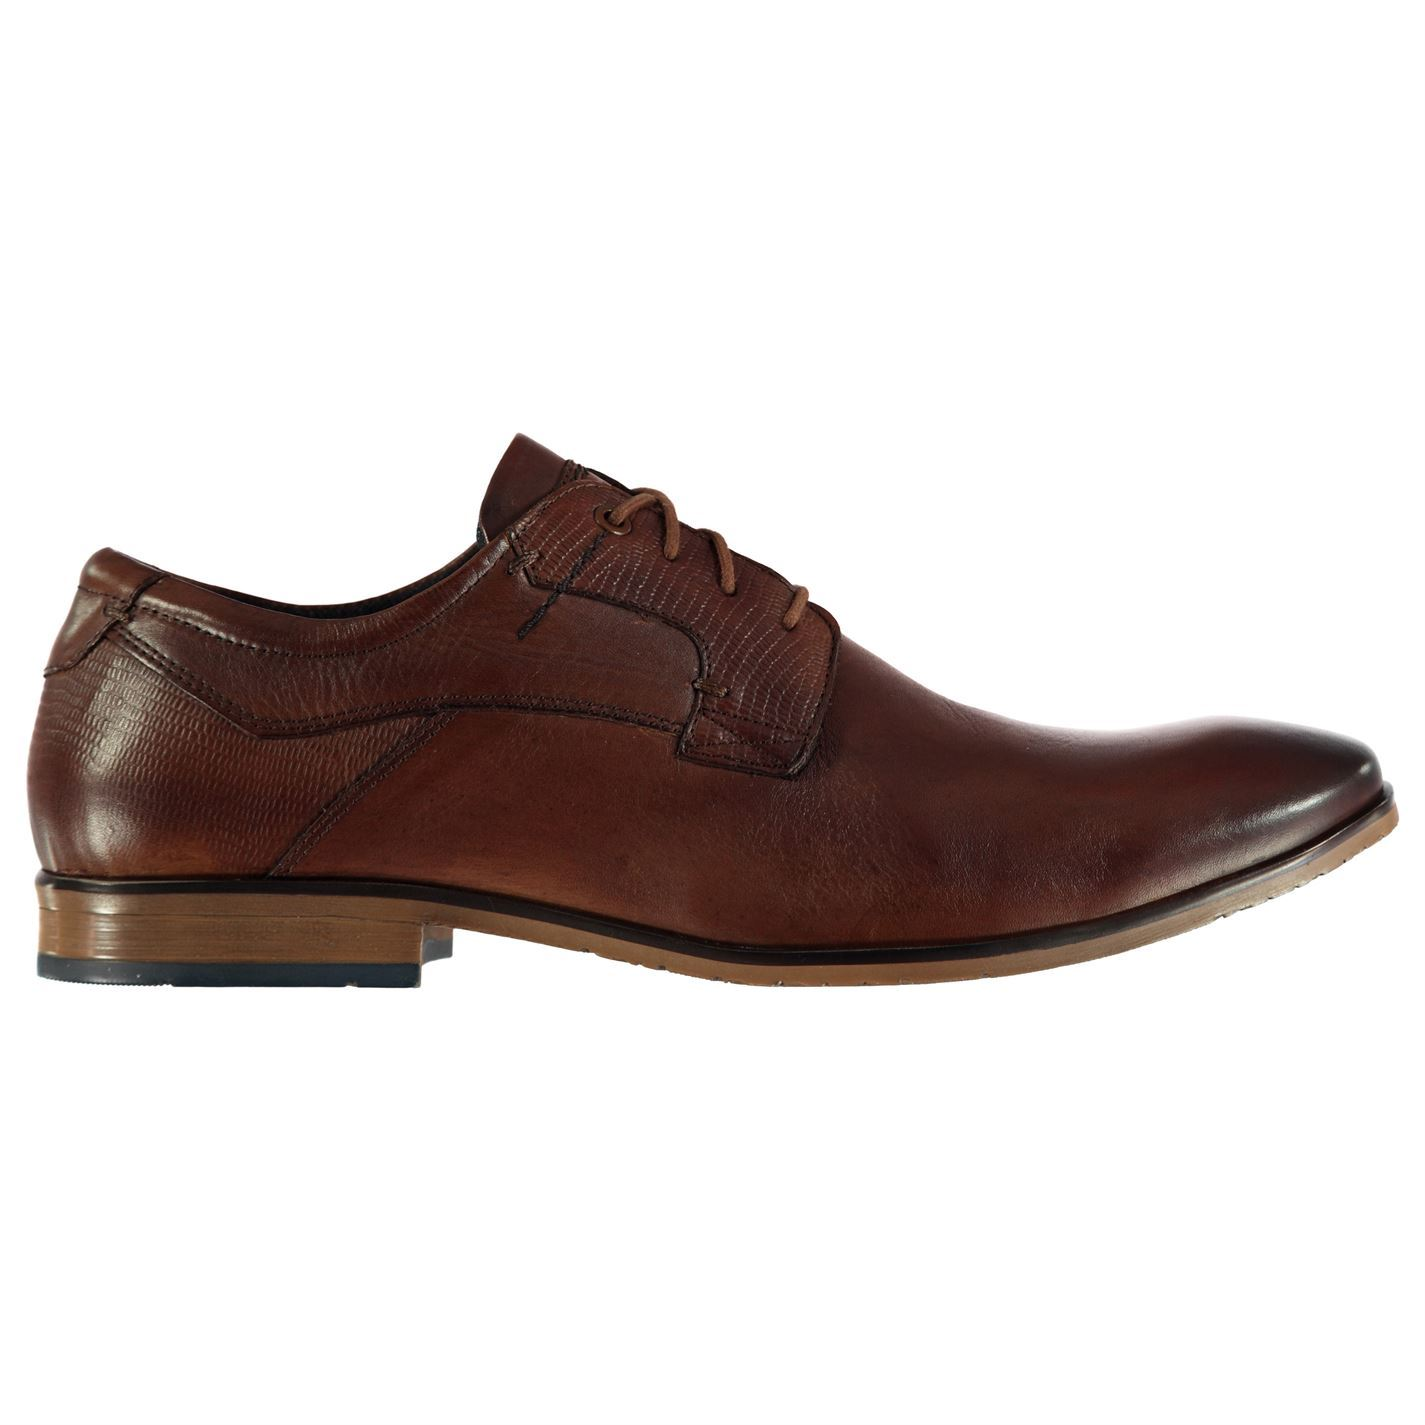 POD  Uomo Pattern Tie Schuhes Smart Lace Up Up Up Slight Heel TextuROT Panelling Tonal 7ed15c